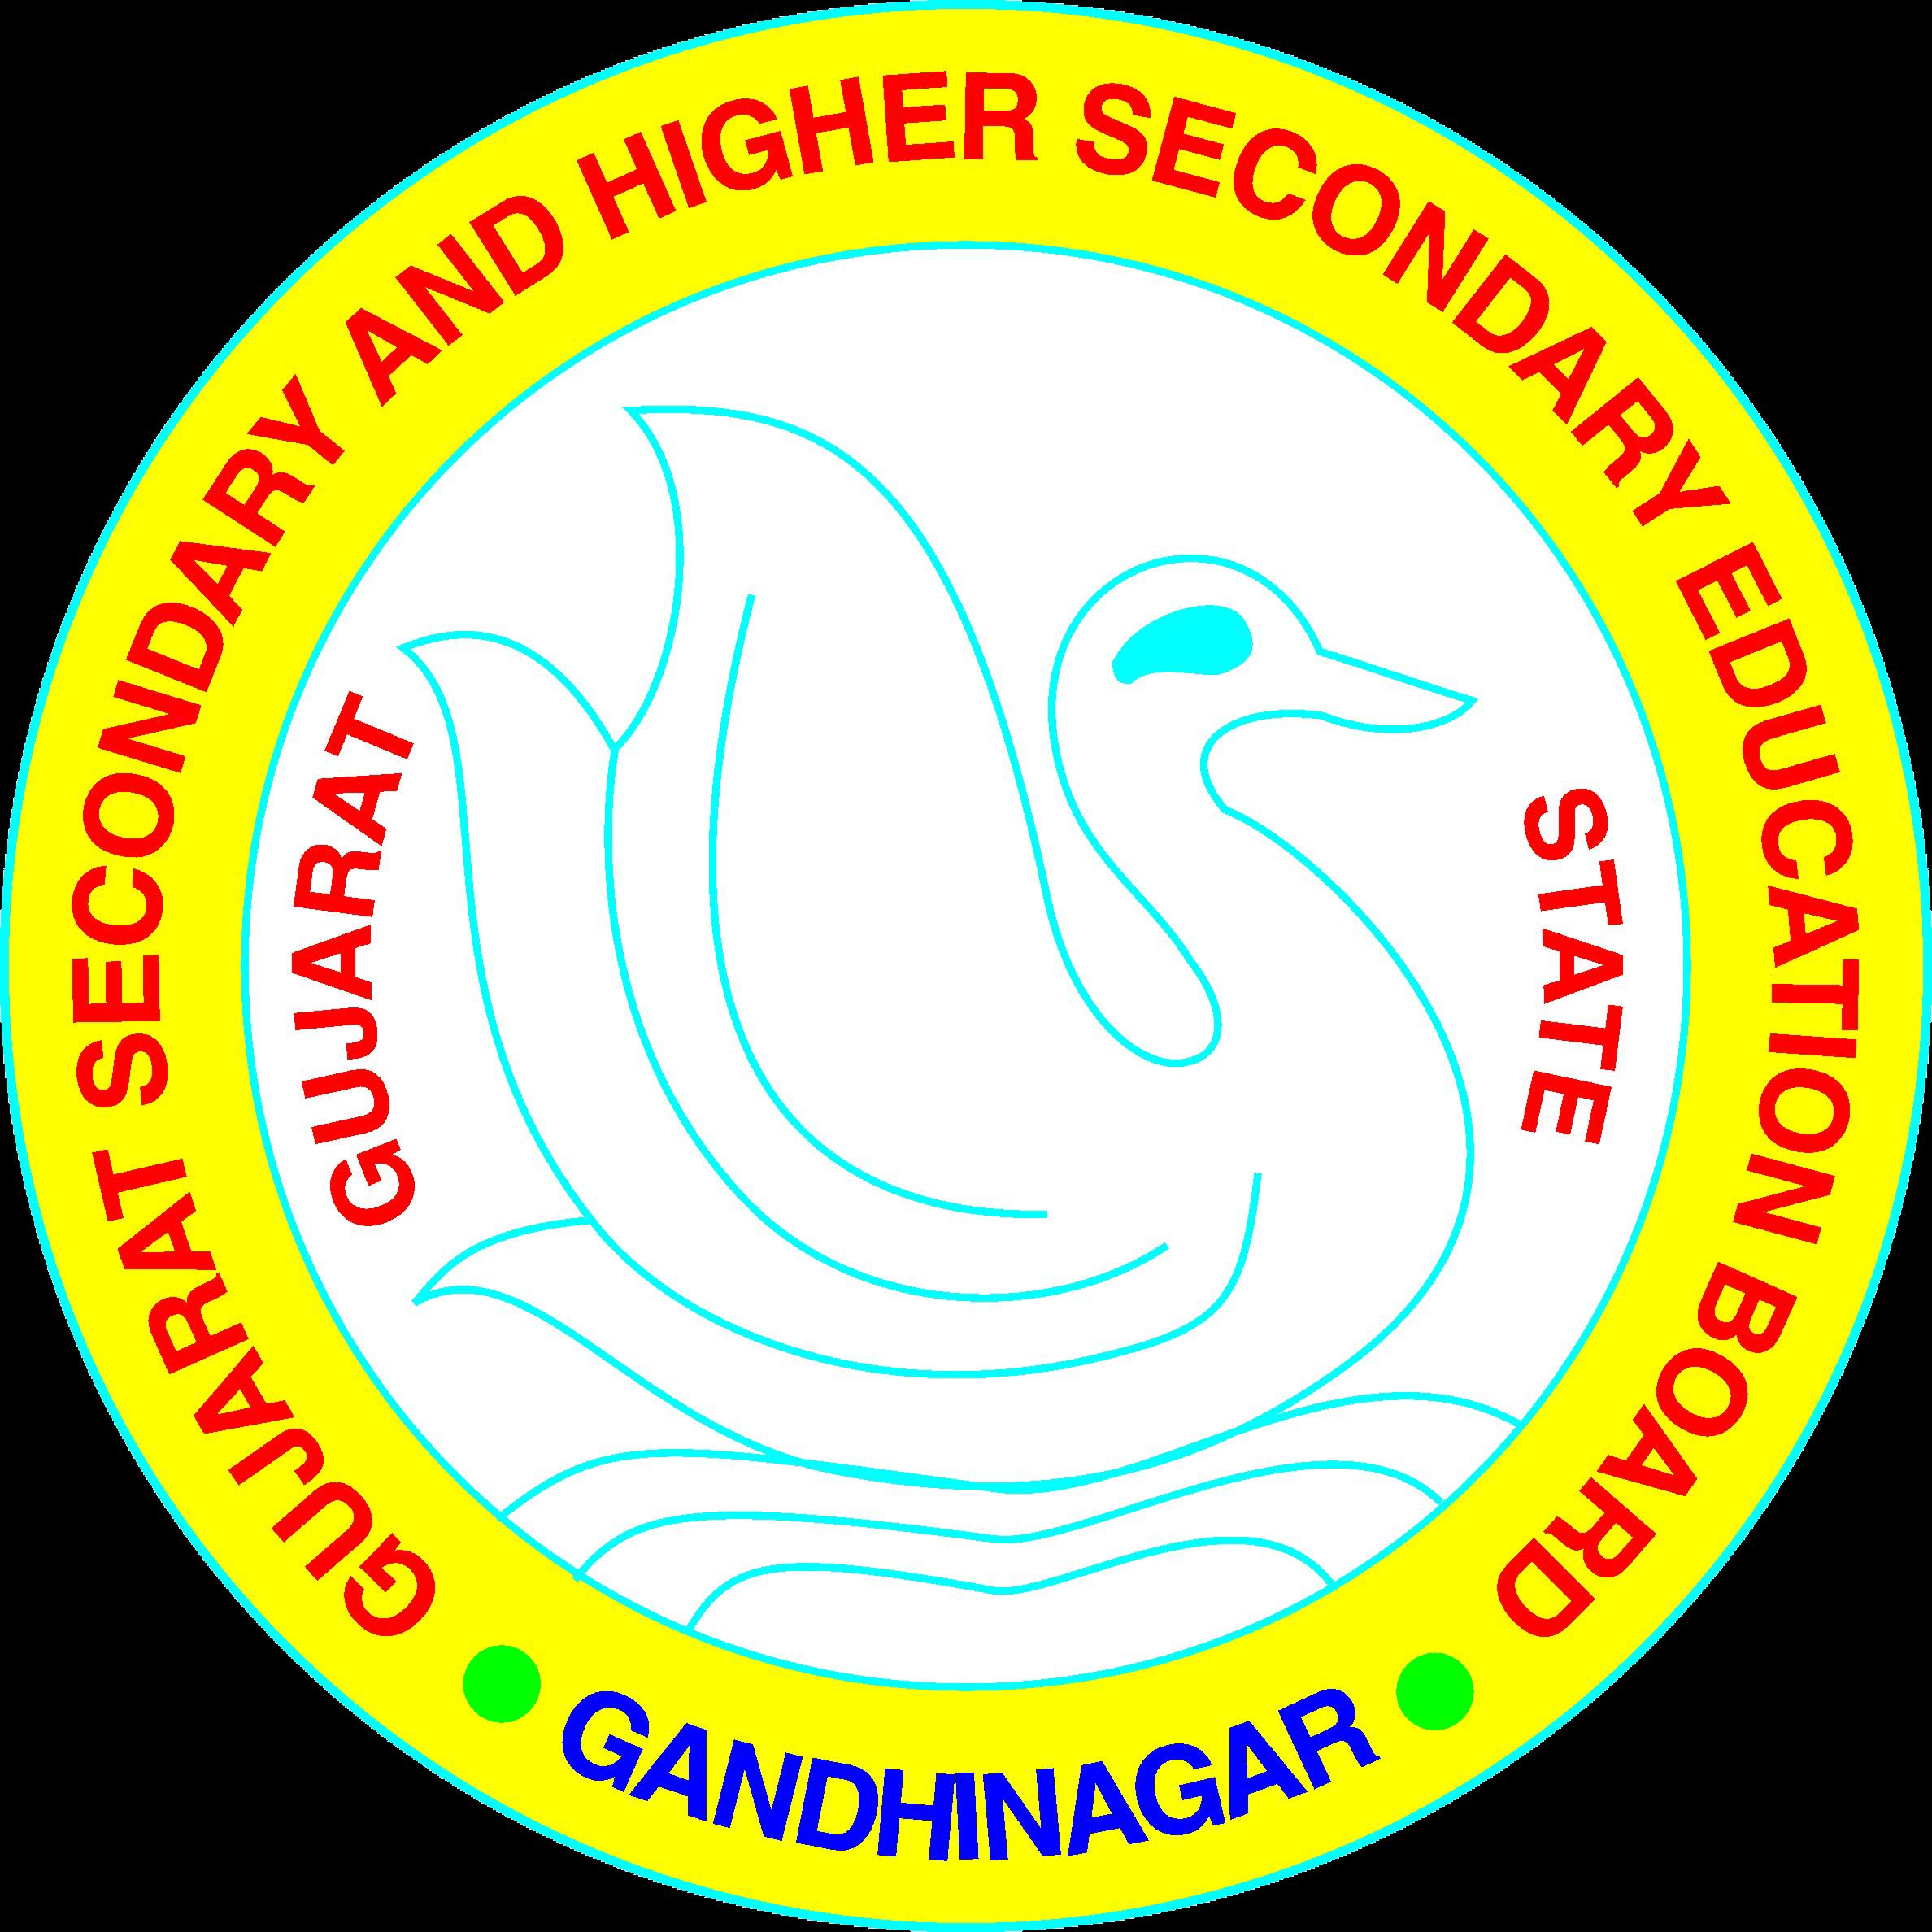 Gujarat Common Entrance Exam (GUJCET)